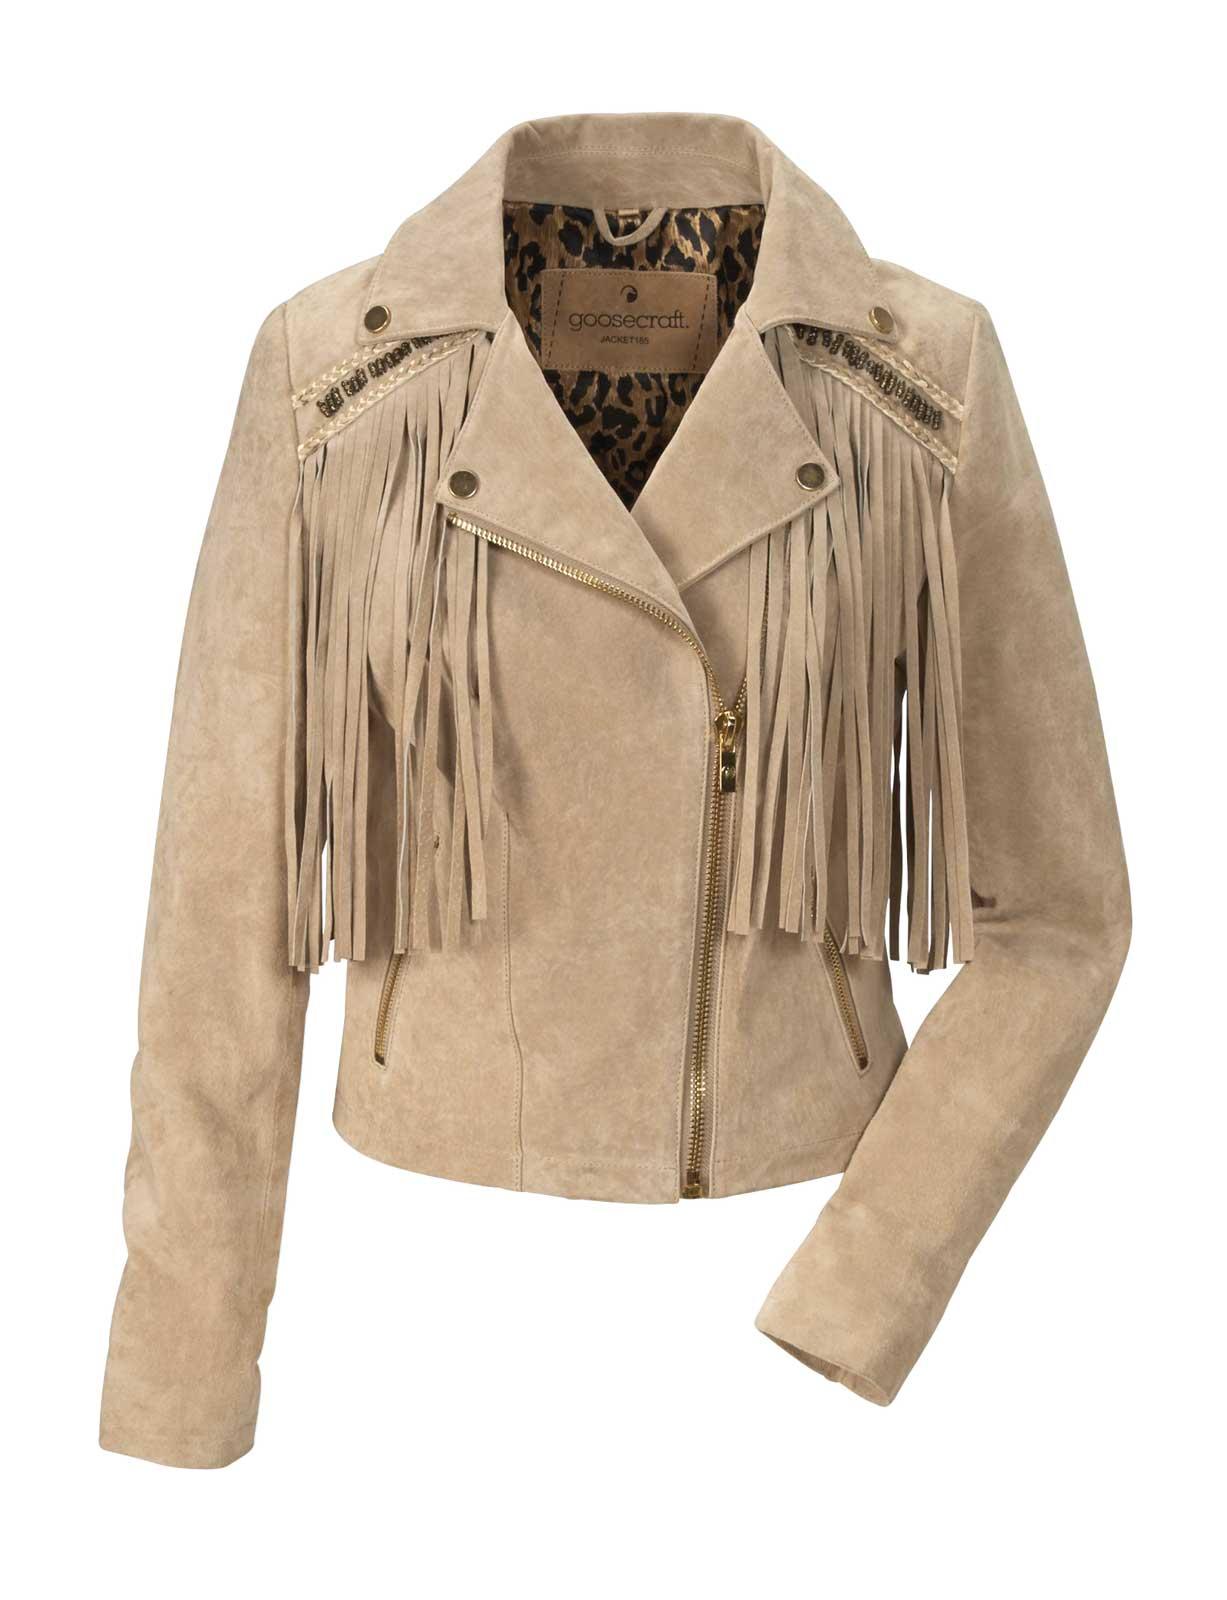 best website 59de4 64741 Details zu Goosecraft Damen Marken-Lederjacke mit Fransen, natur